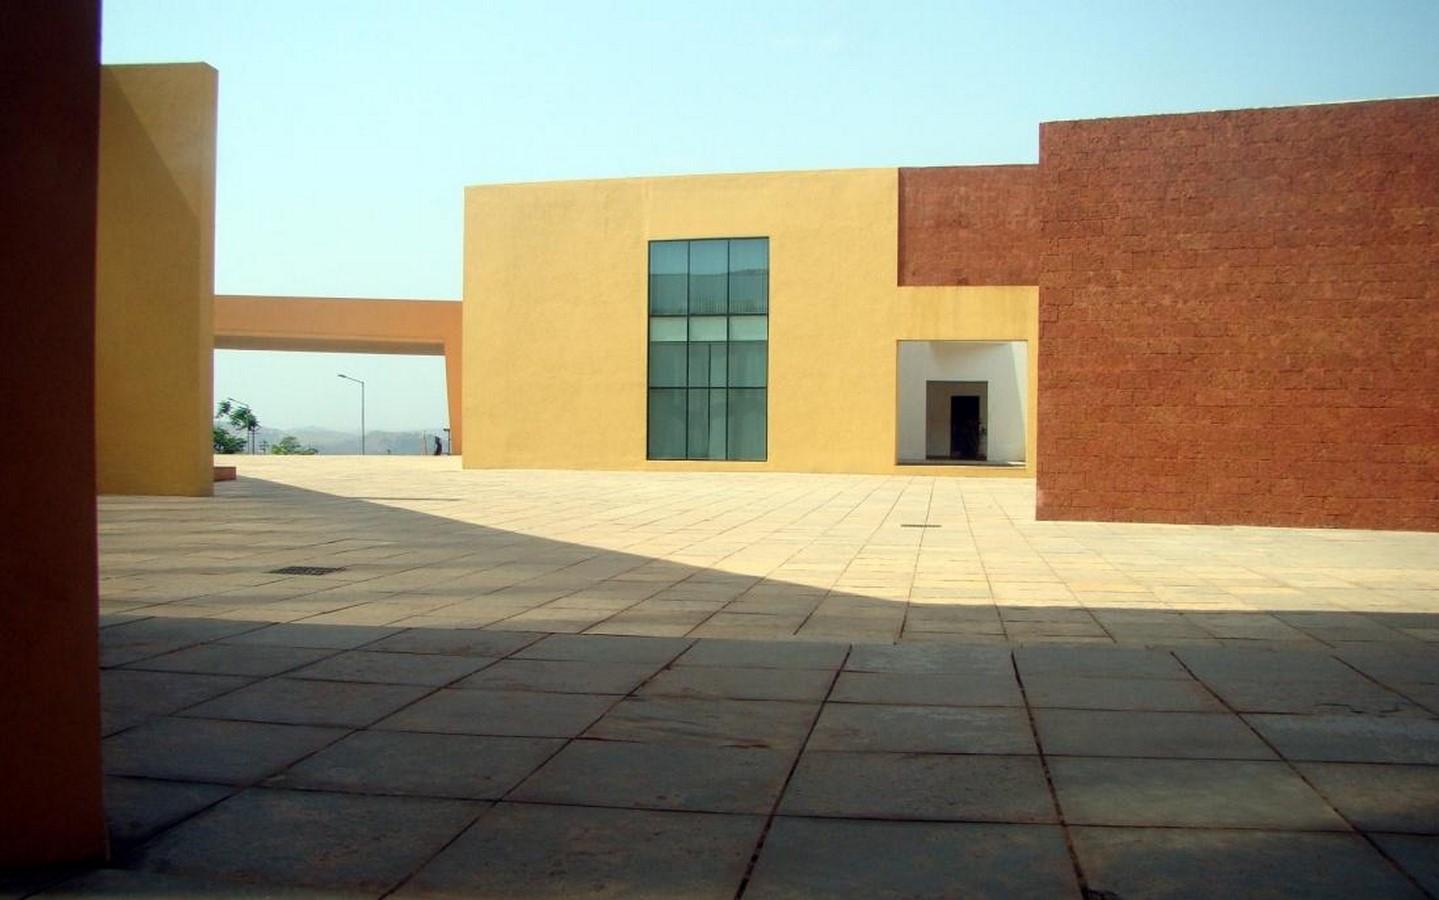 Goa institute of management by Brinda Somaya: Bridge between traditional and conventional design - Sheet1